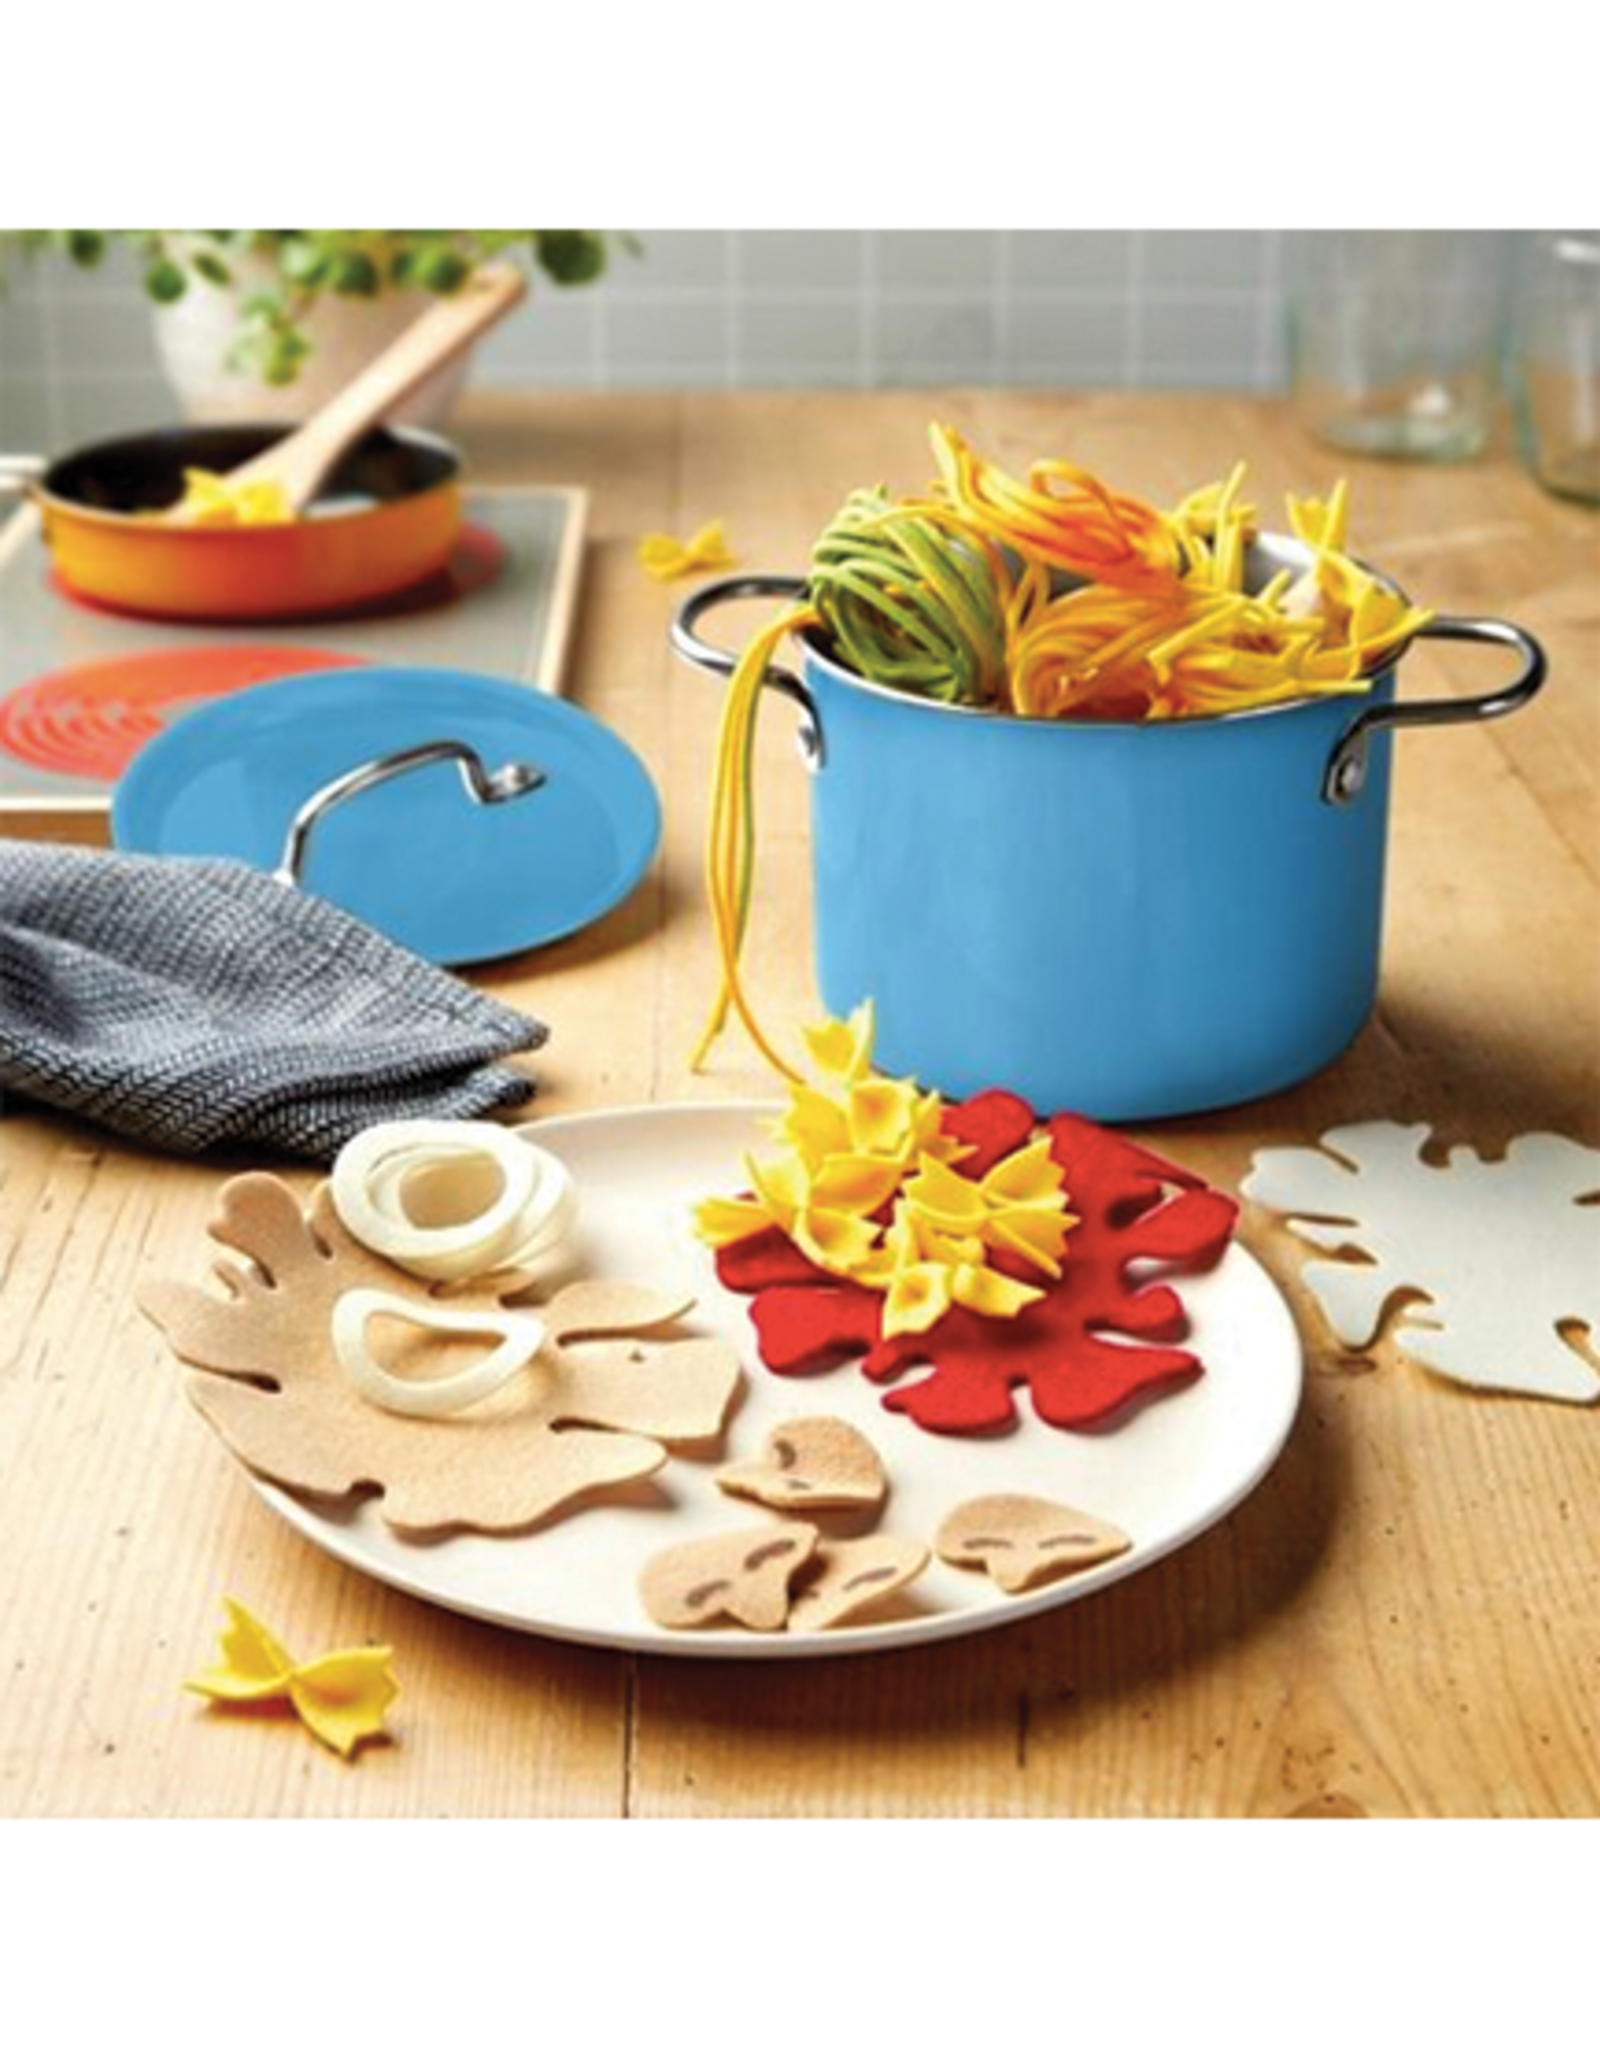 Haba Biofino Pasta Time Cooking Set